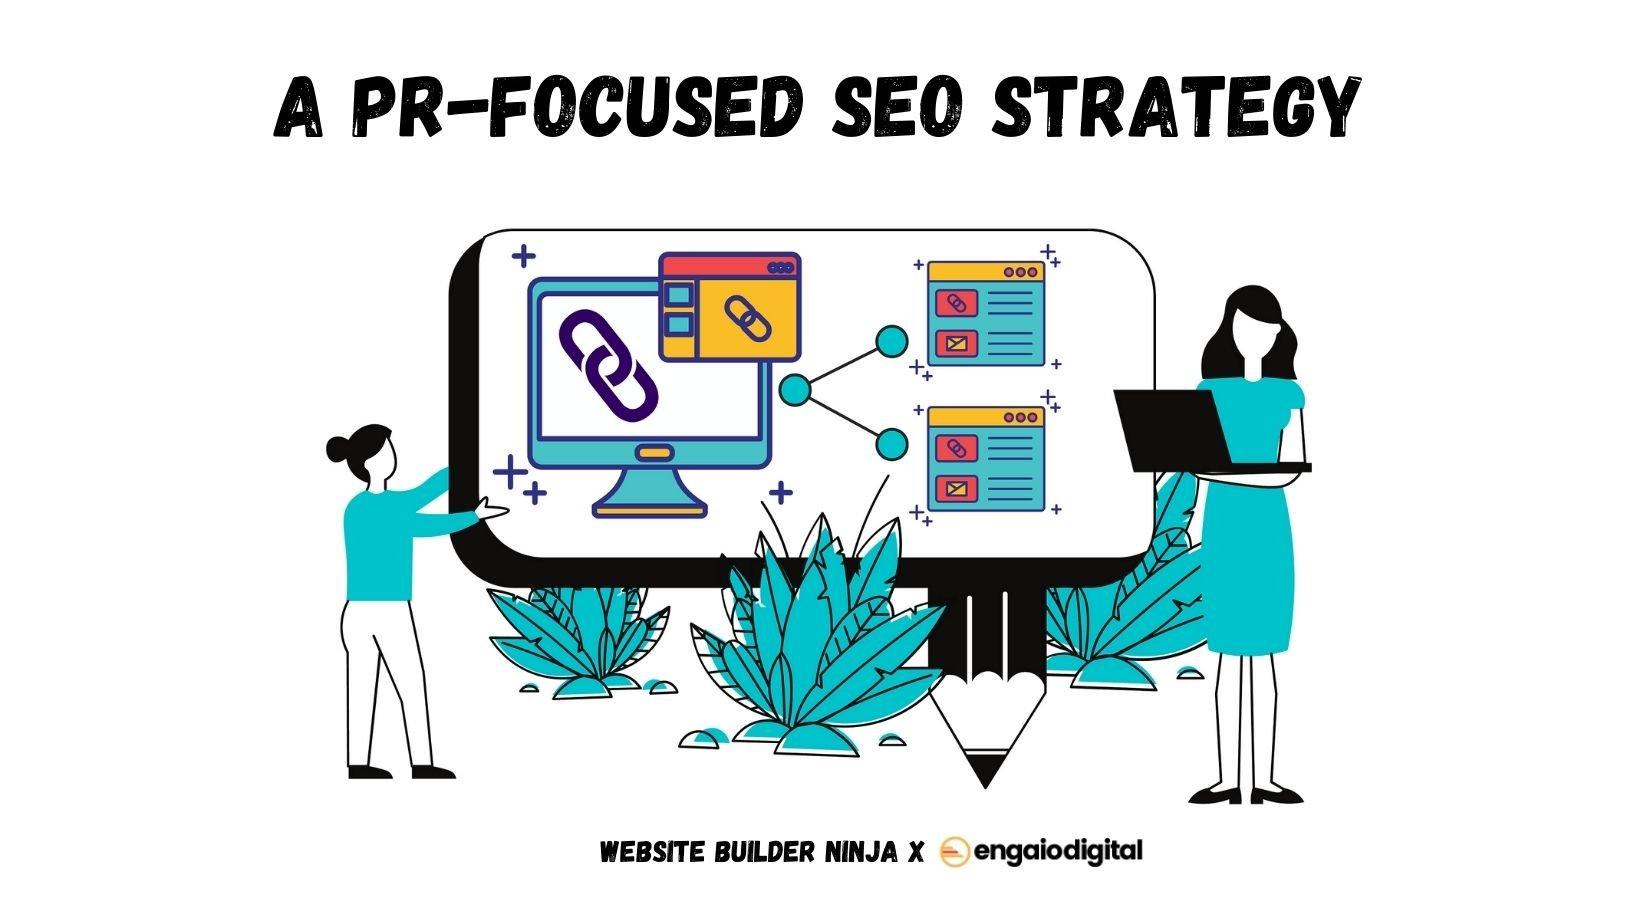 A PR-Focused SEO Strategy